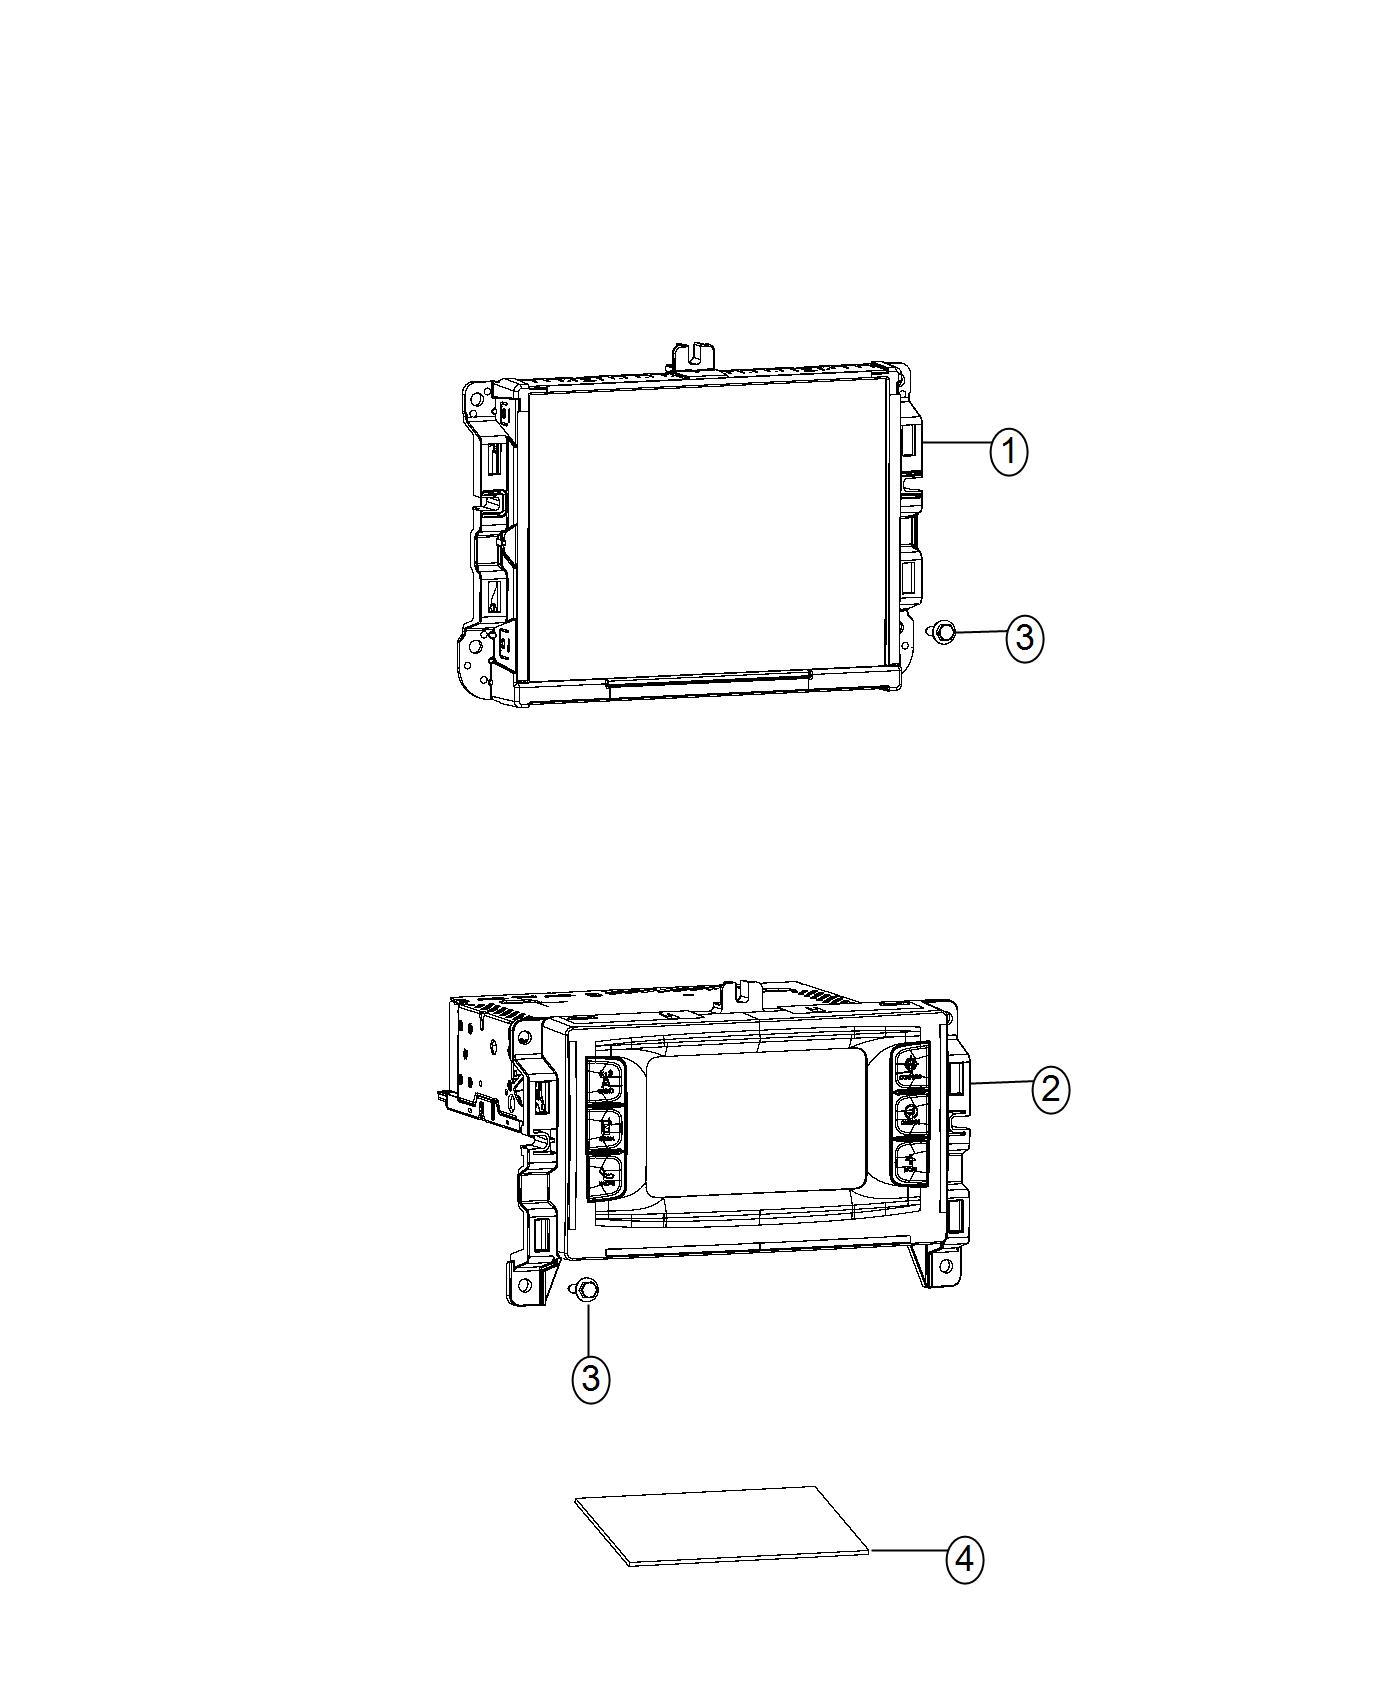 2017 chrysler 200 radio multi media instrument panel. Black Bedroom Furniture Sets. Home Design Ideas